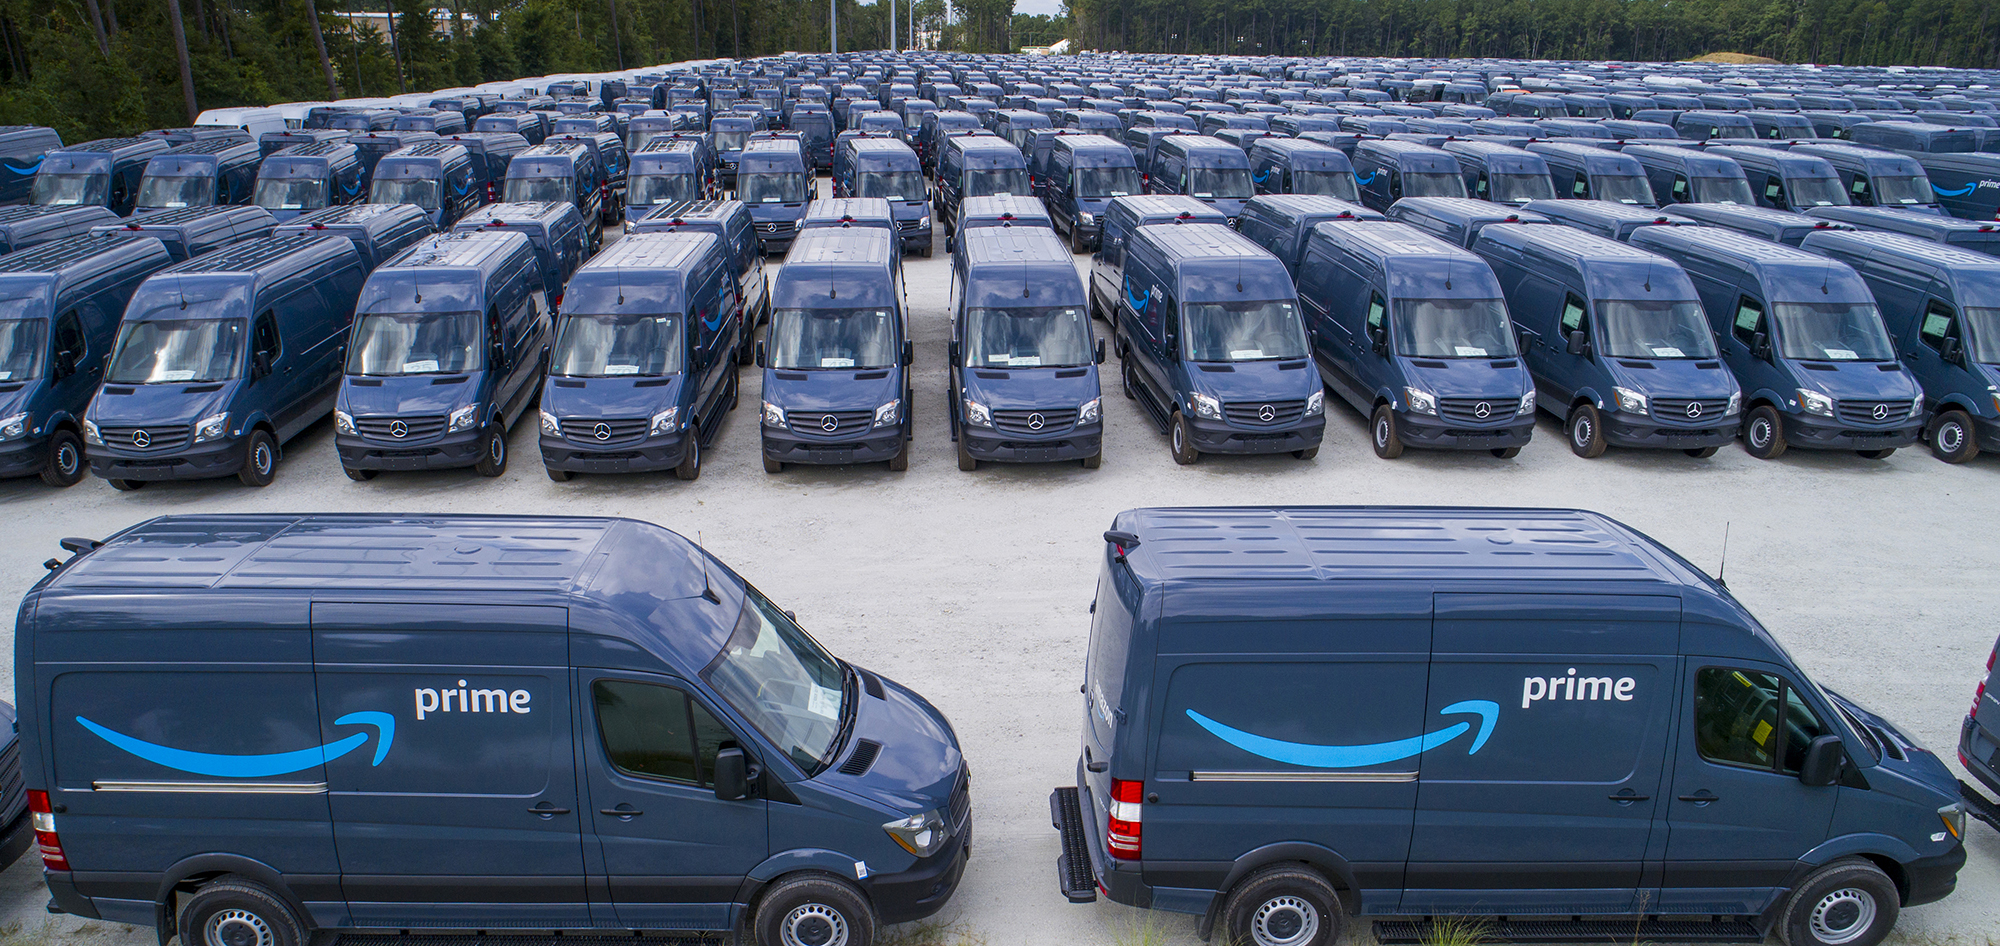 2deb82ff30701 Amazon and Mercedes Benz partnership